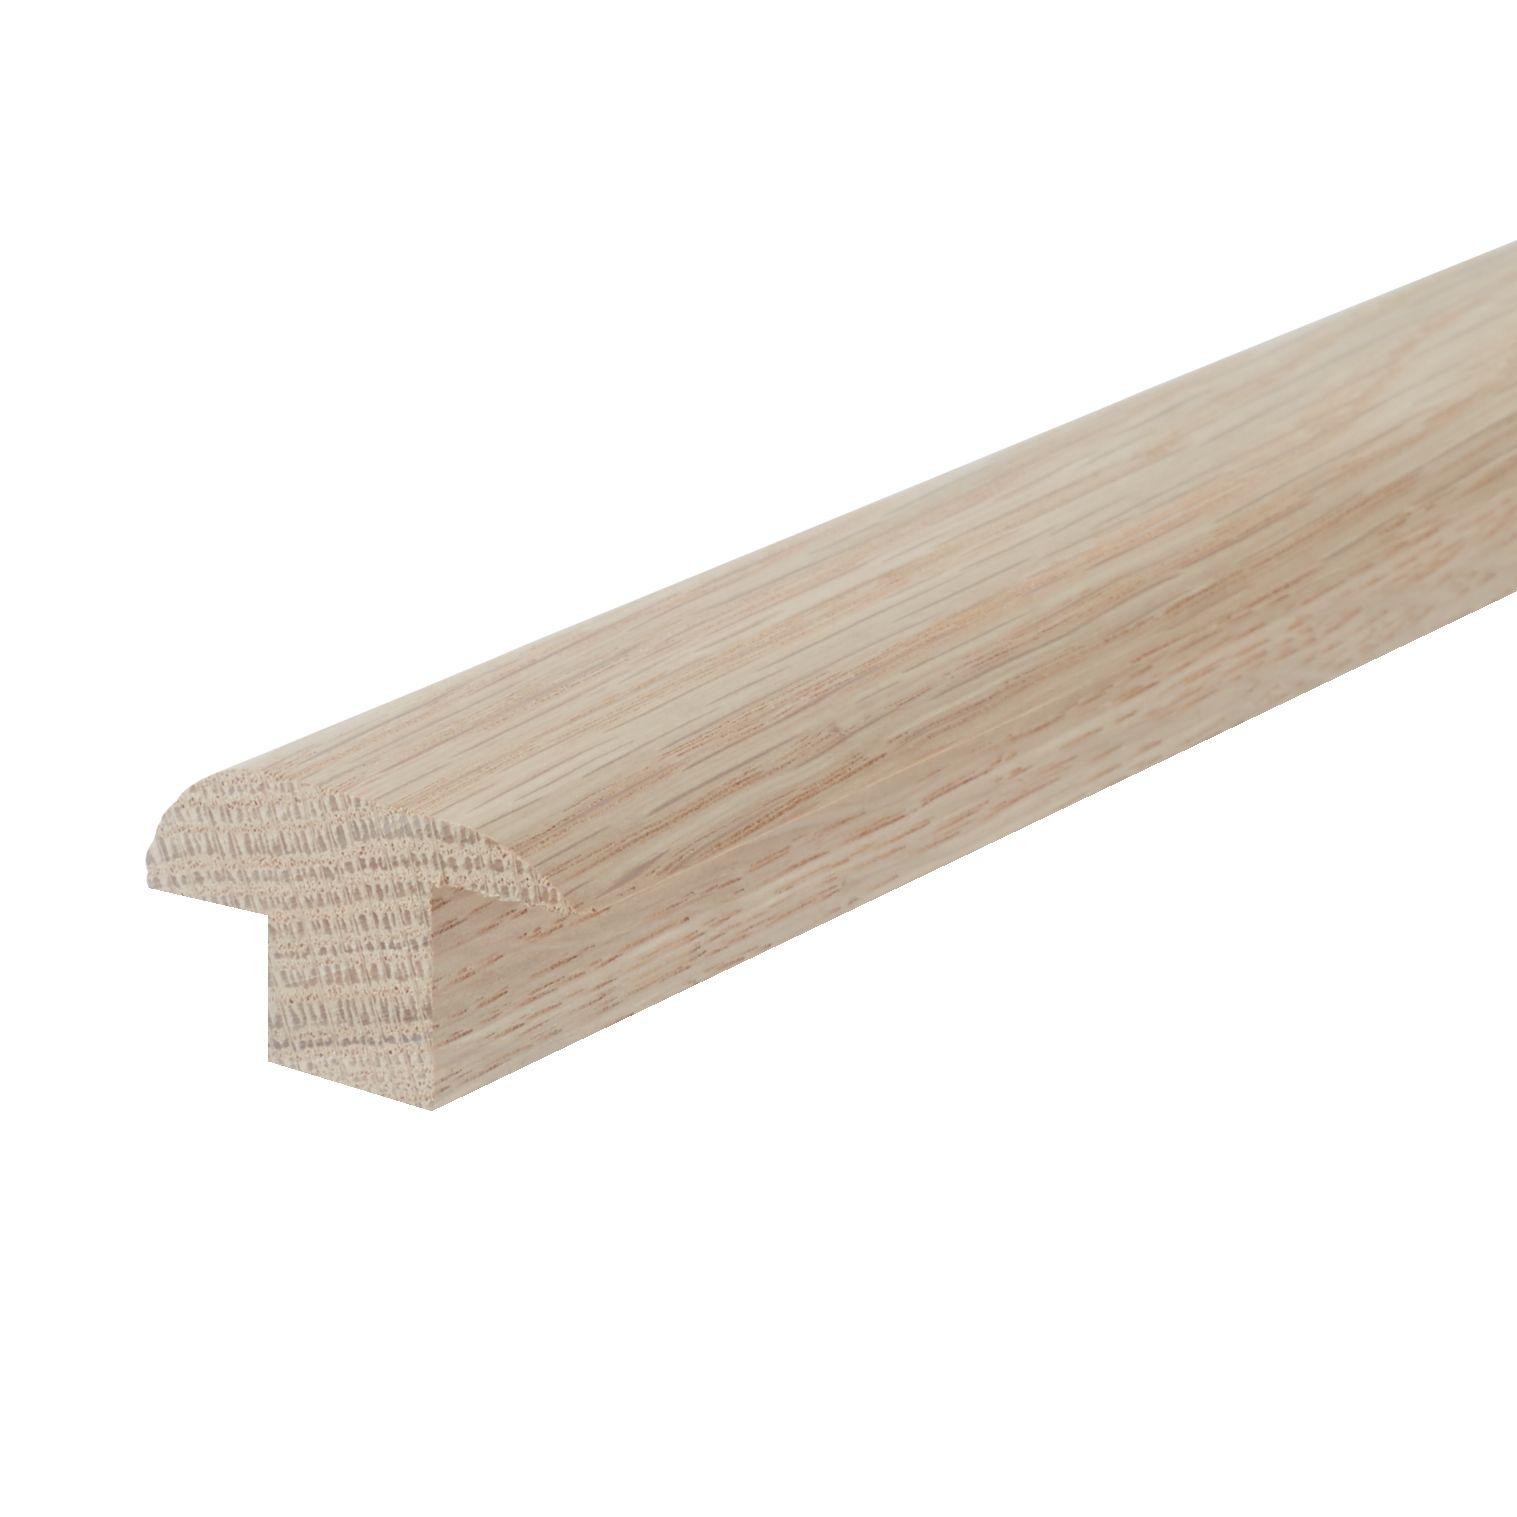 oak wood to carpet door threshold with rebate